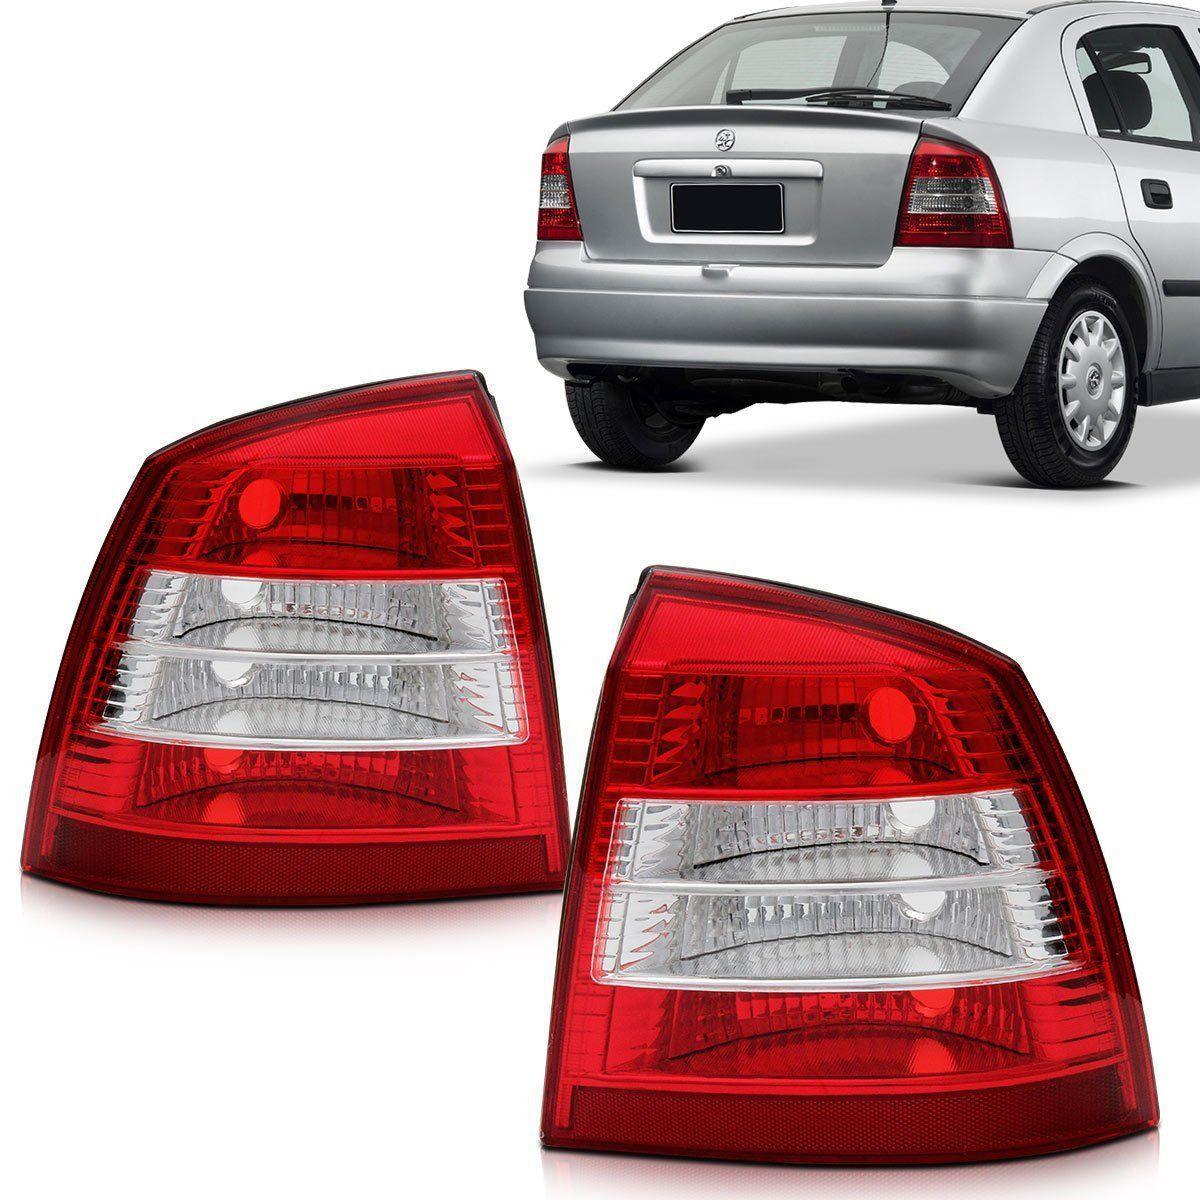 Lanterna Astra Hatch 98 99 2000 2001 2002 Bicolor